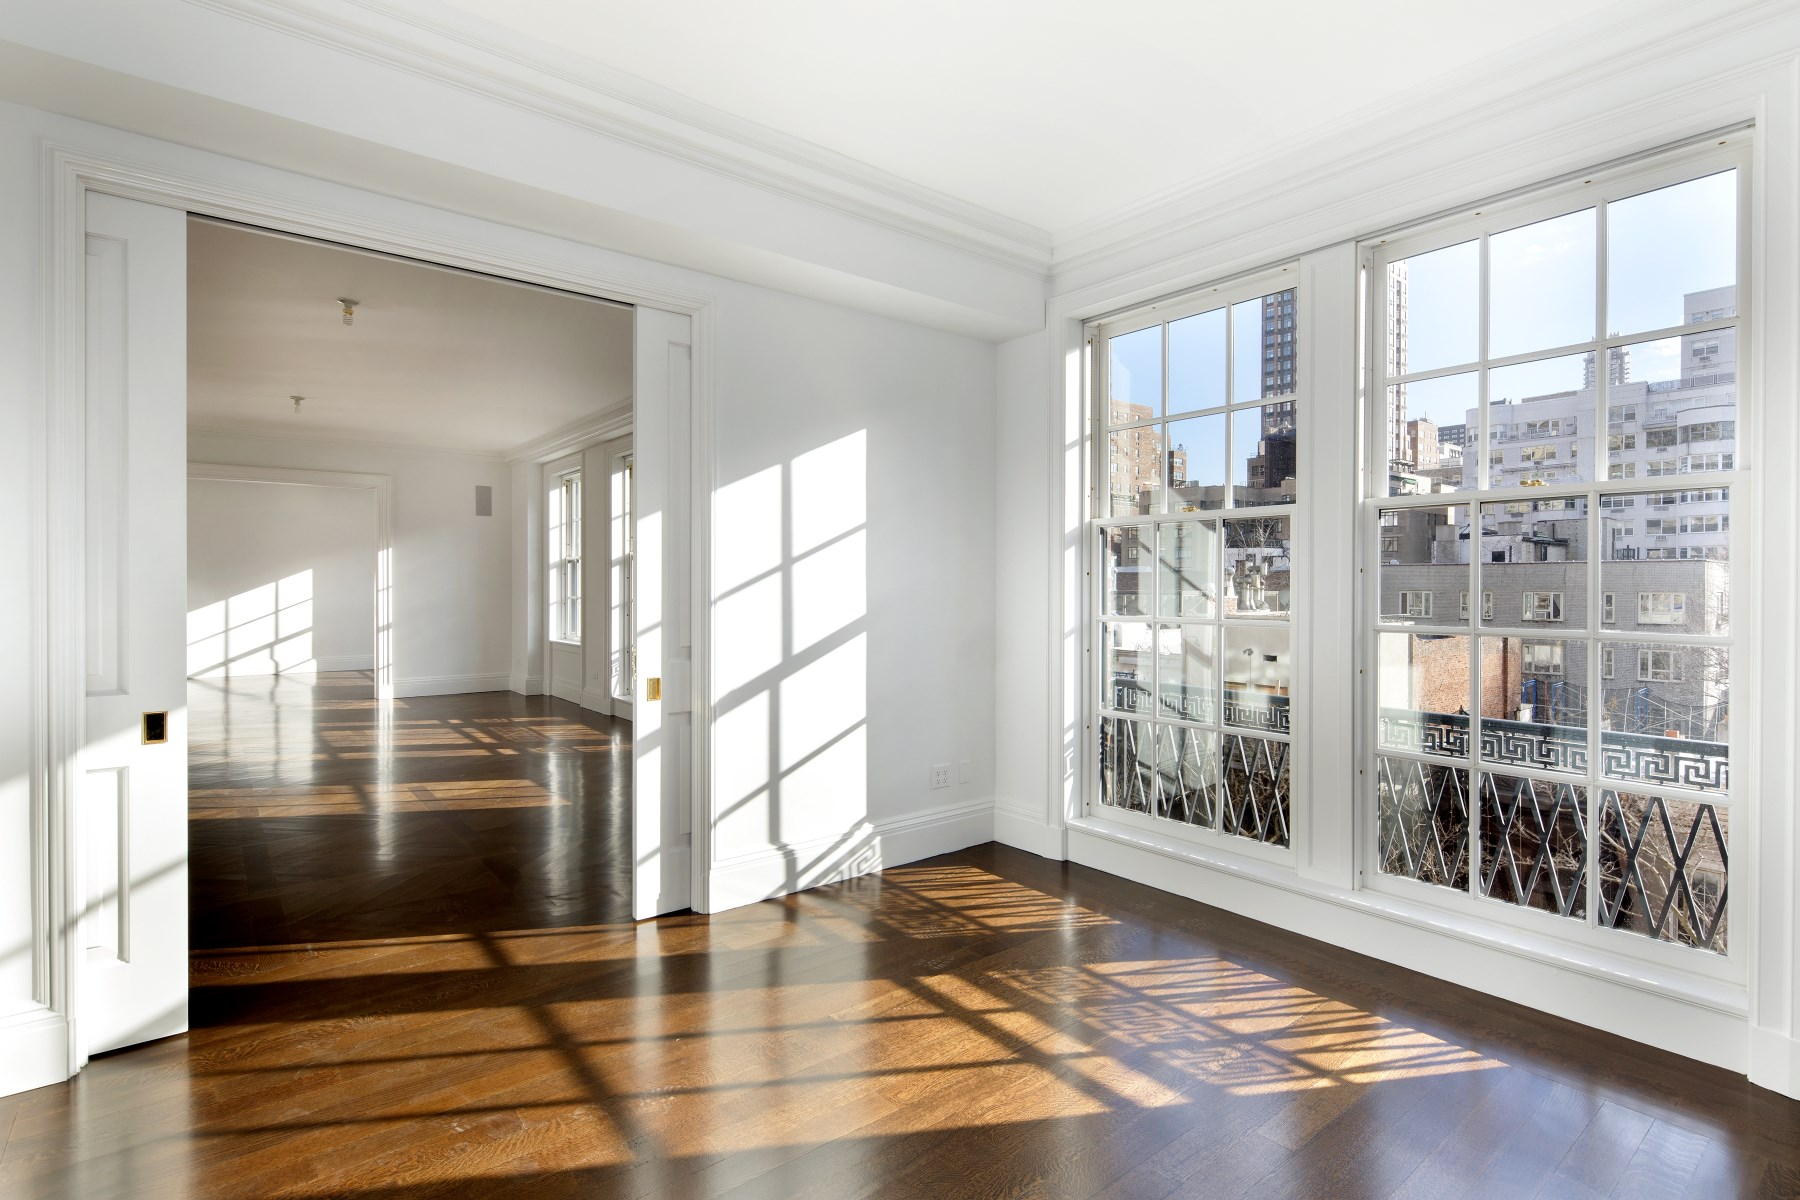 rentals property at 151 East 78th Street, Apt 6